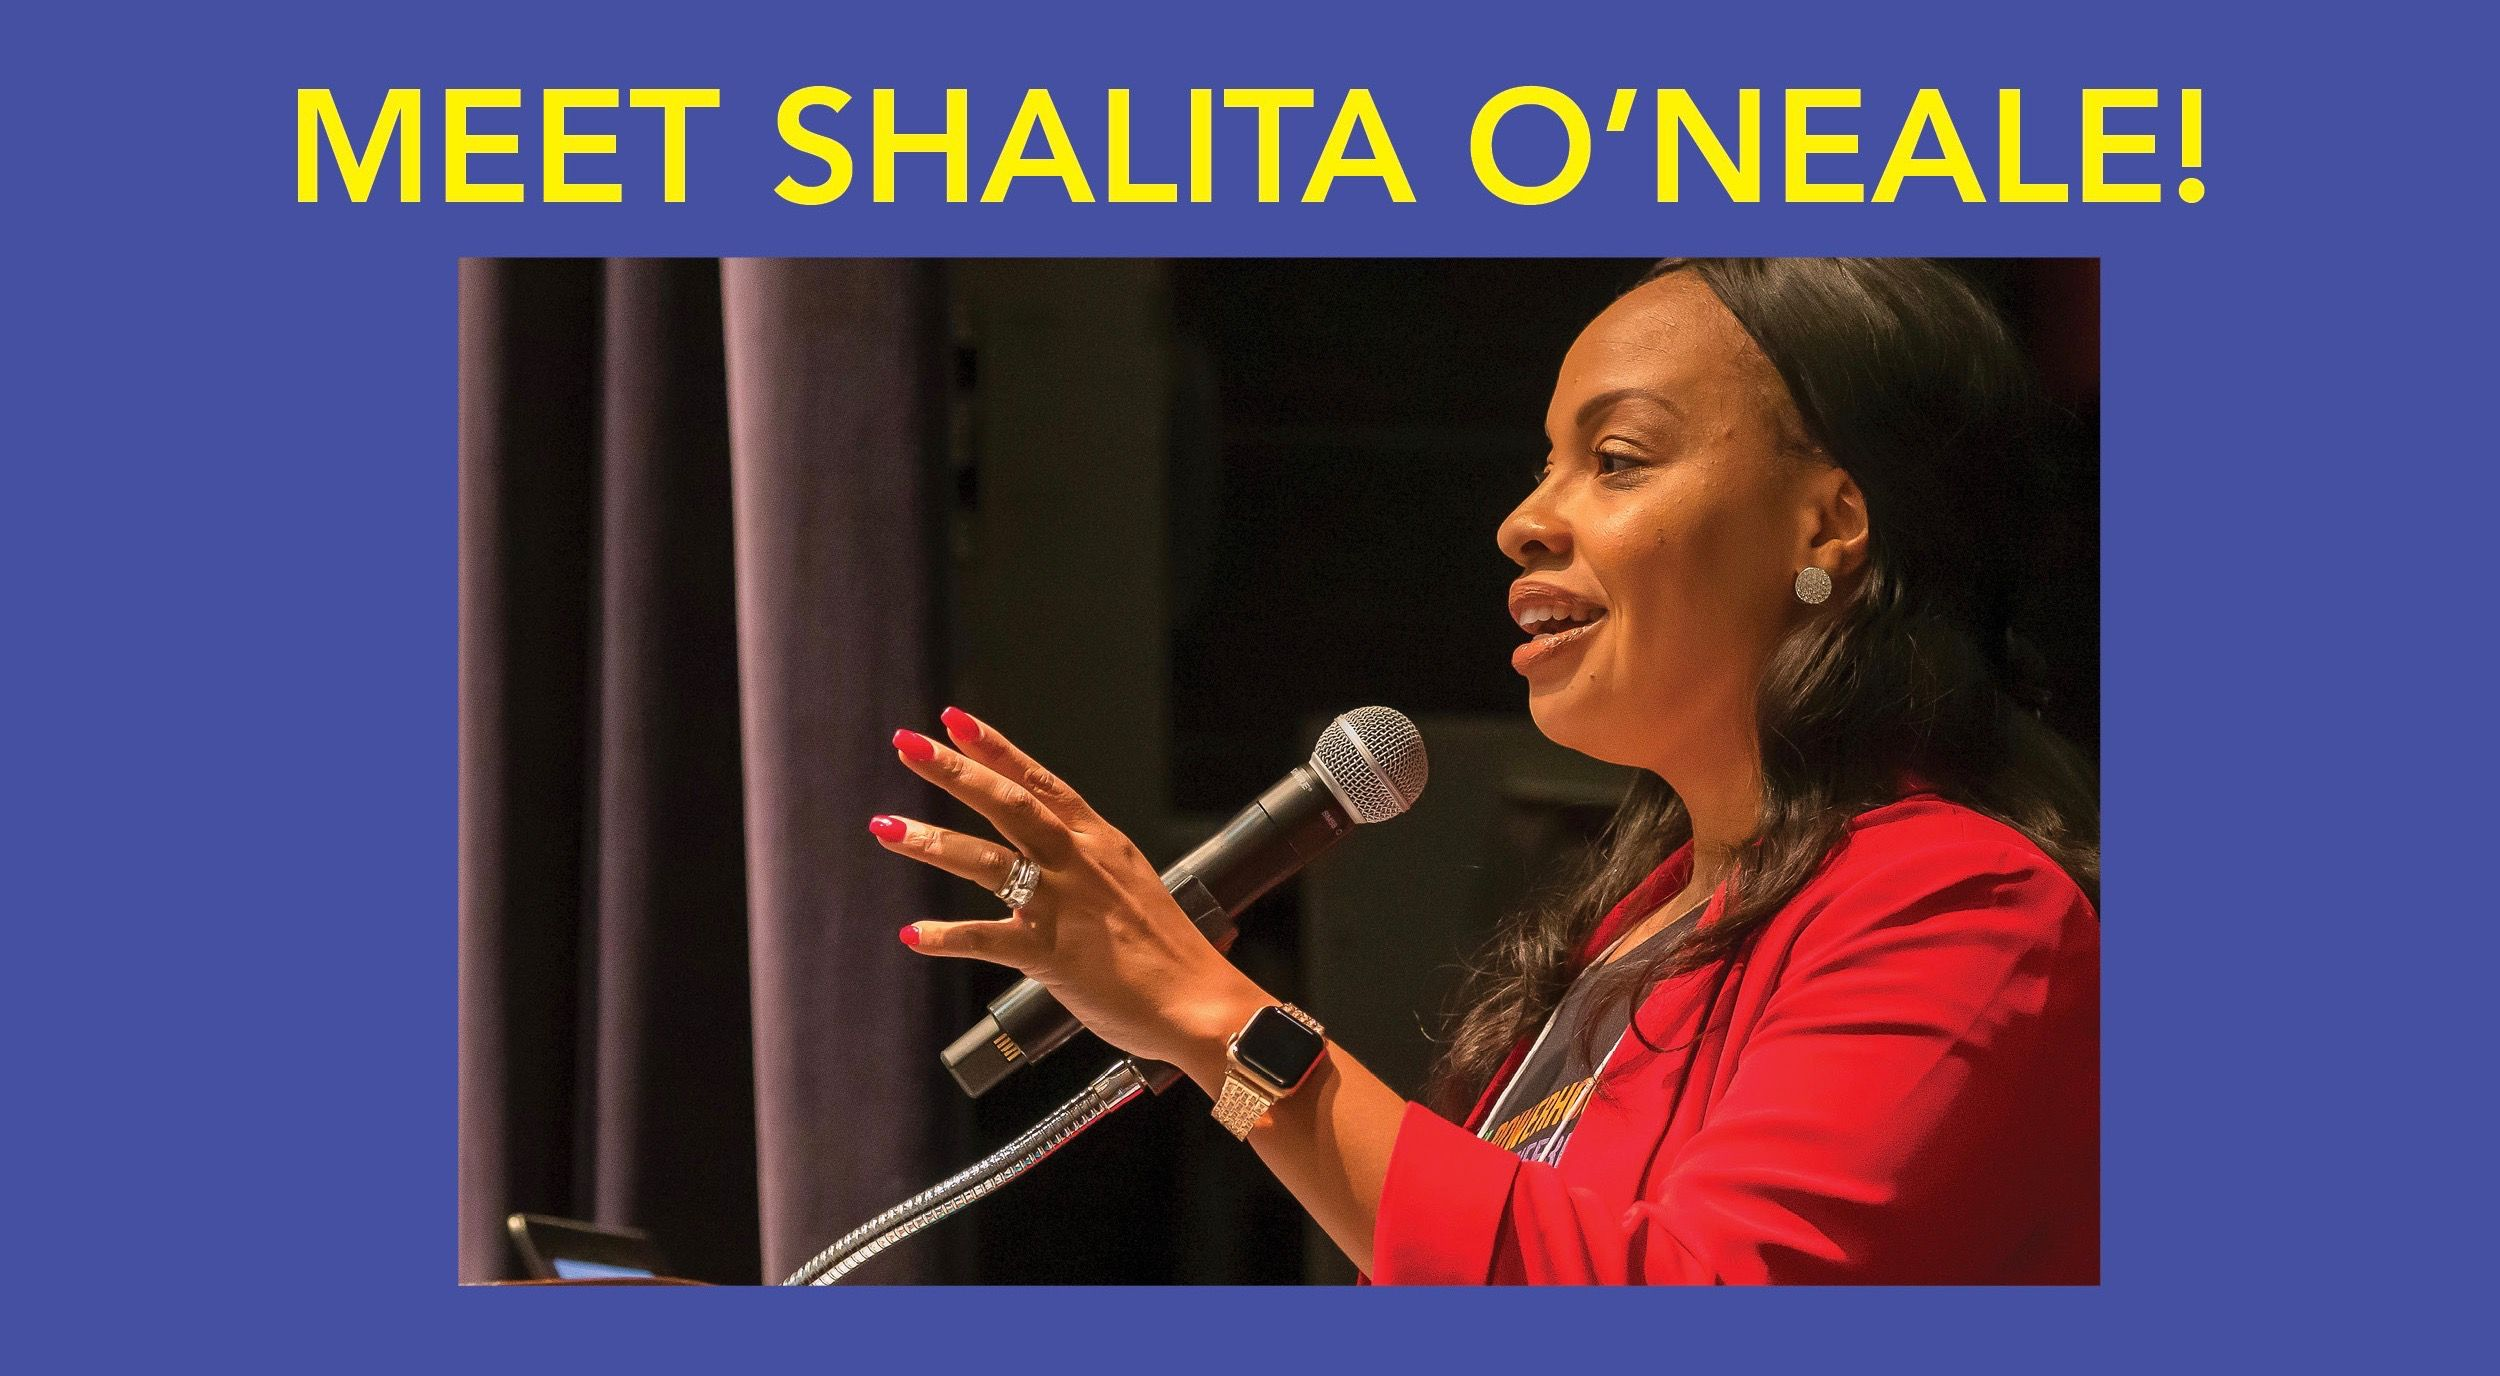 Meet Shalita O'Neale